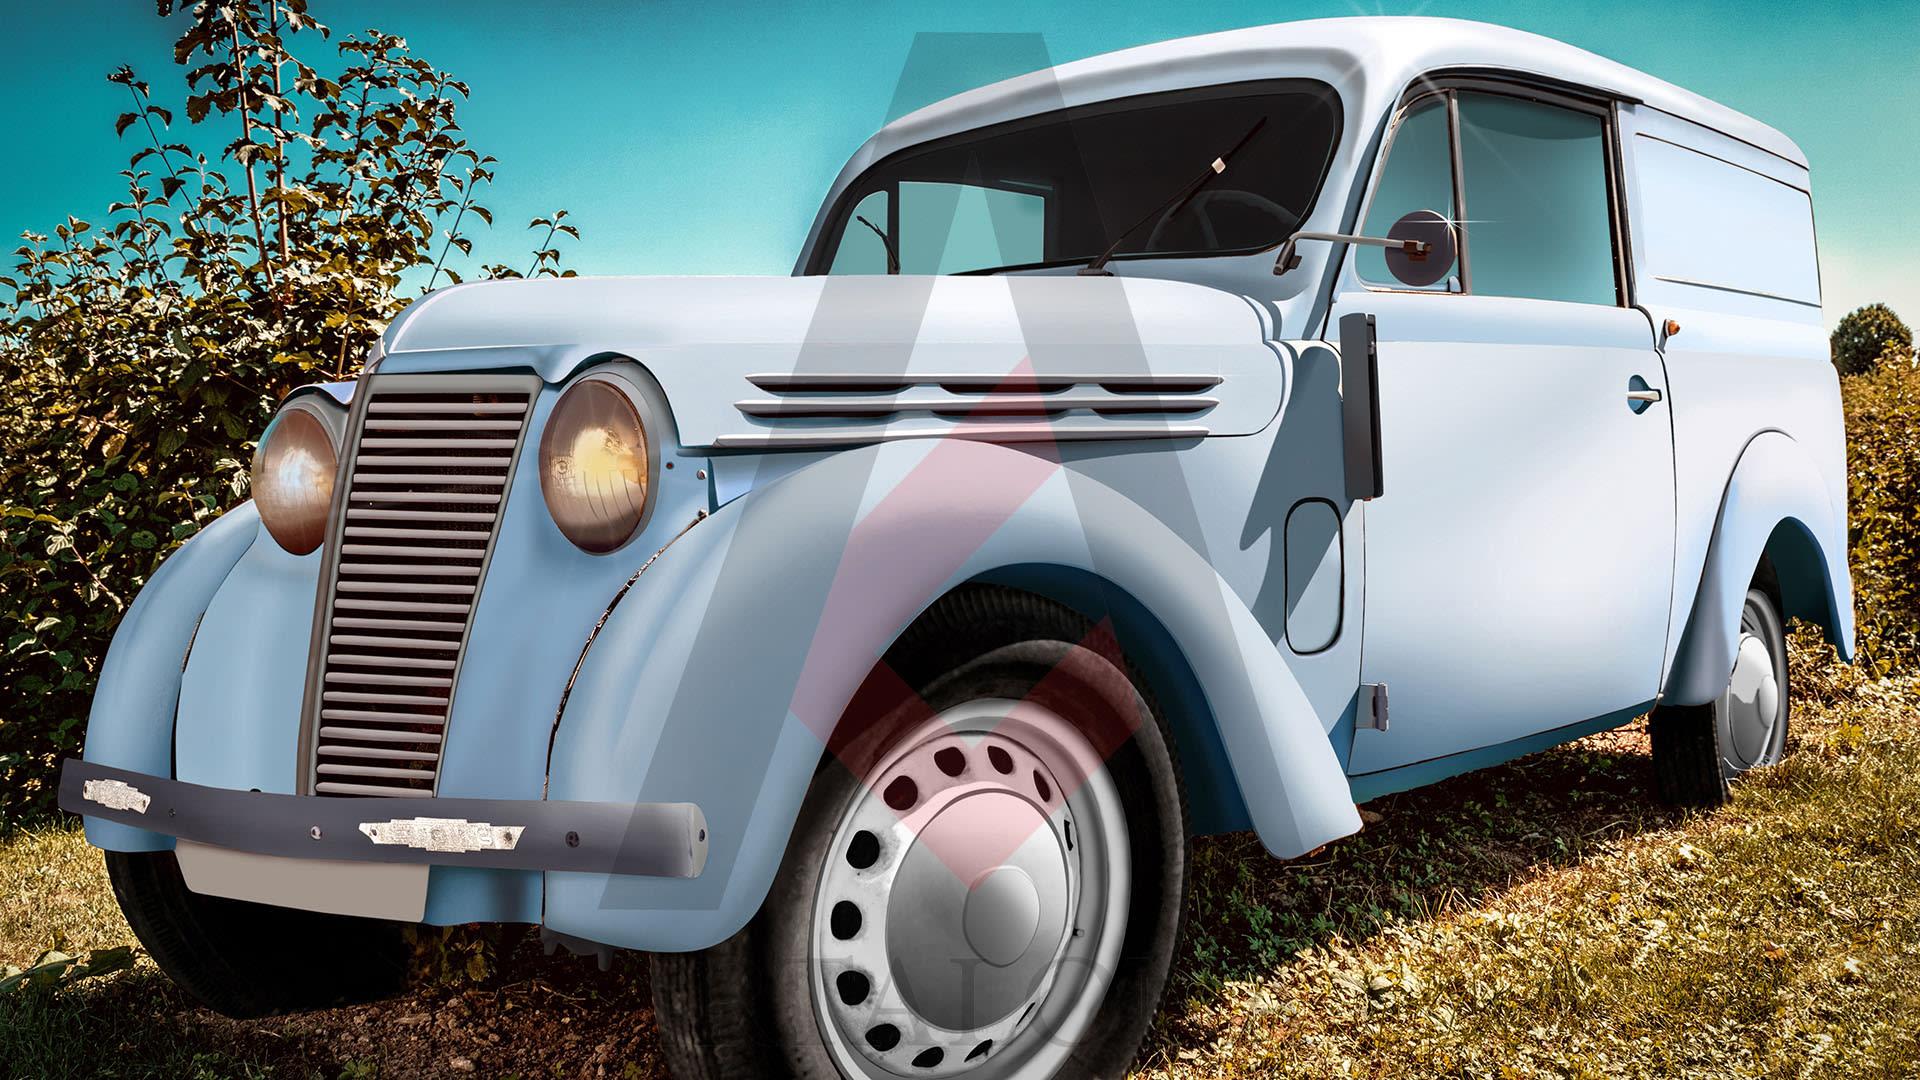 After-Automotive Image Restoration